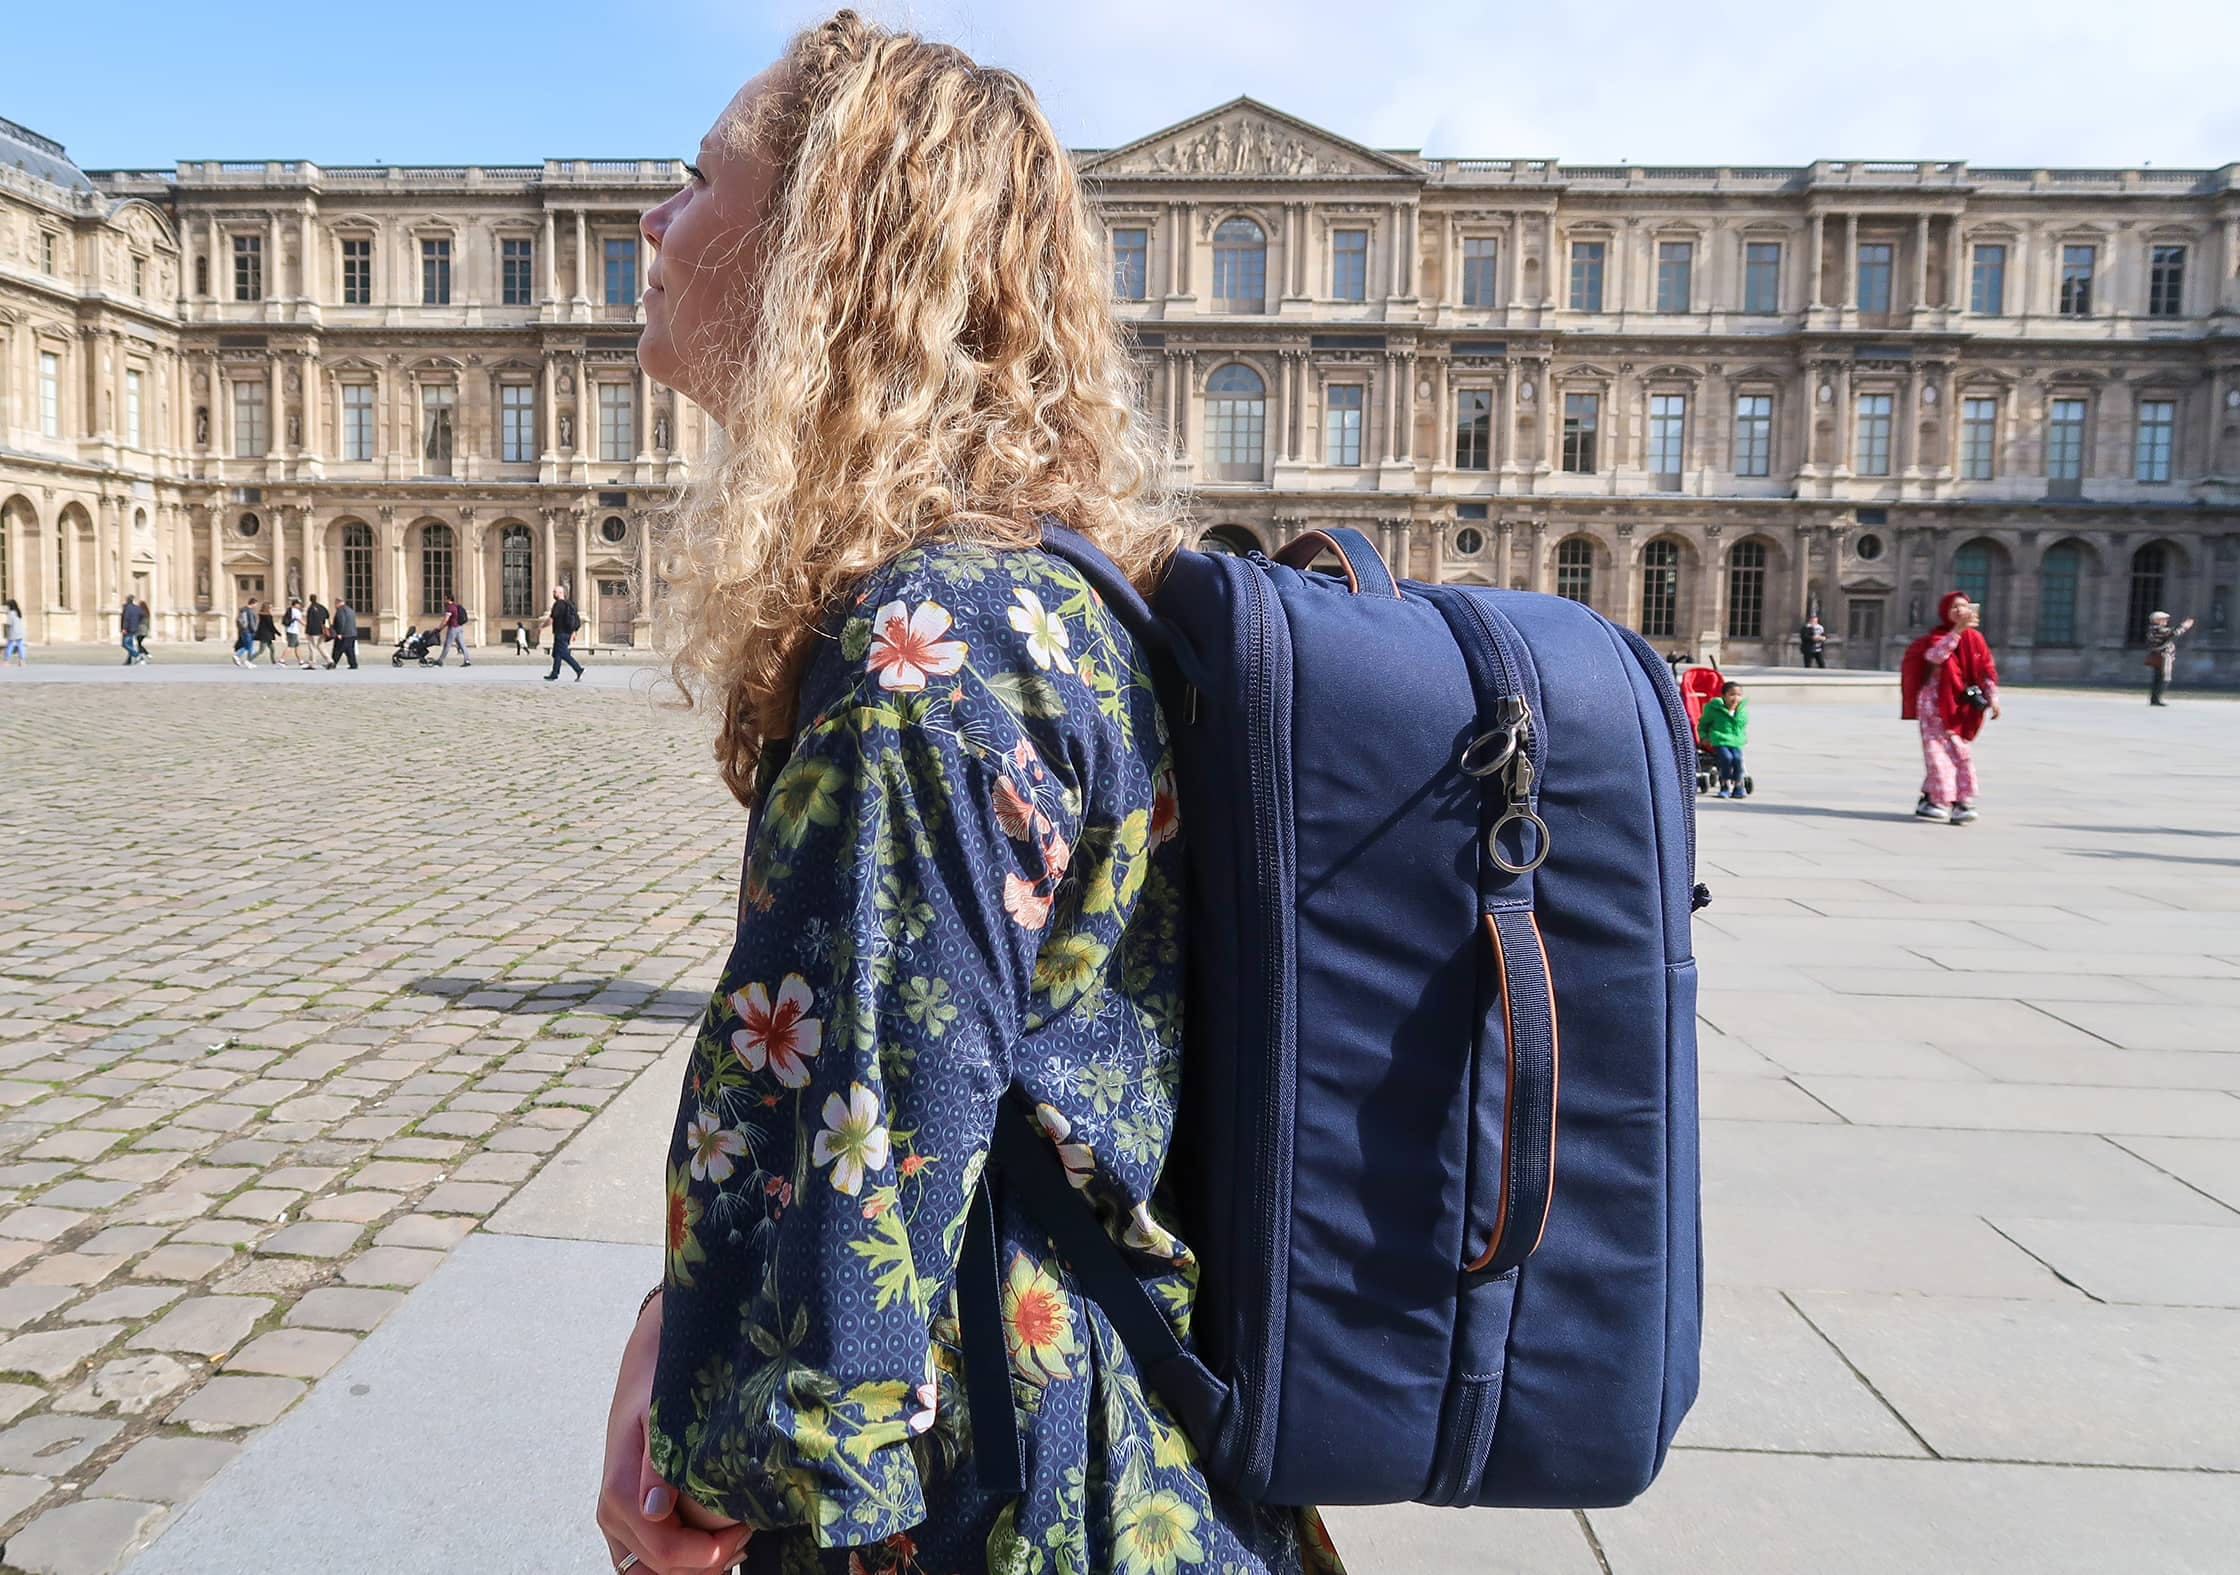 Fjallraven Travel Pack Streamline & Minimalistic Design